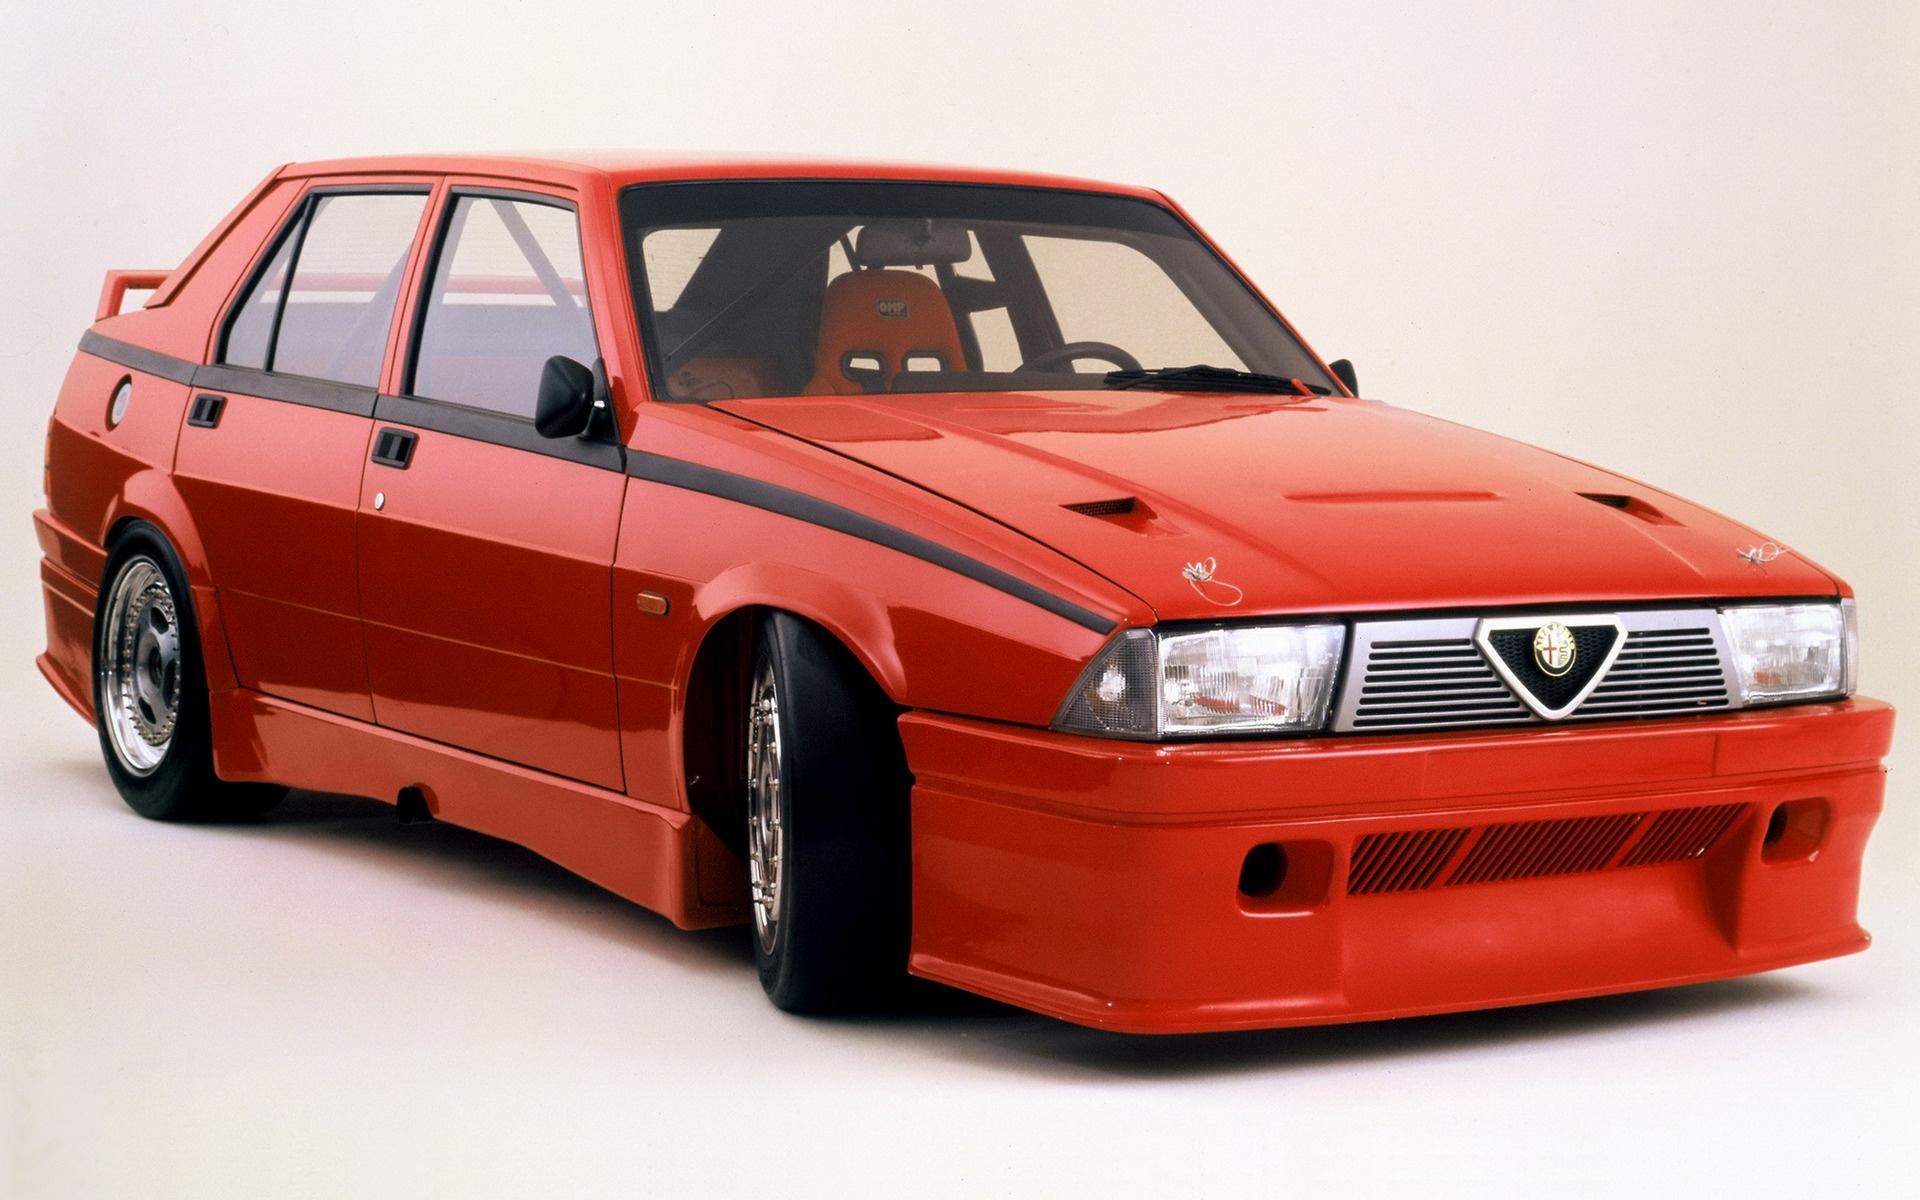 1987 Alfa Romeo 75 Turbo Tcc Prototype Wallpapers And Hd Images Car Pixel